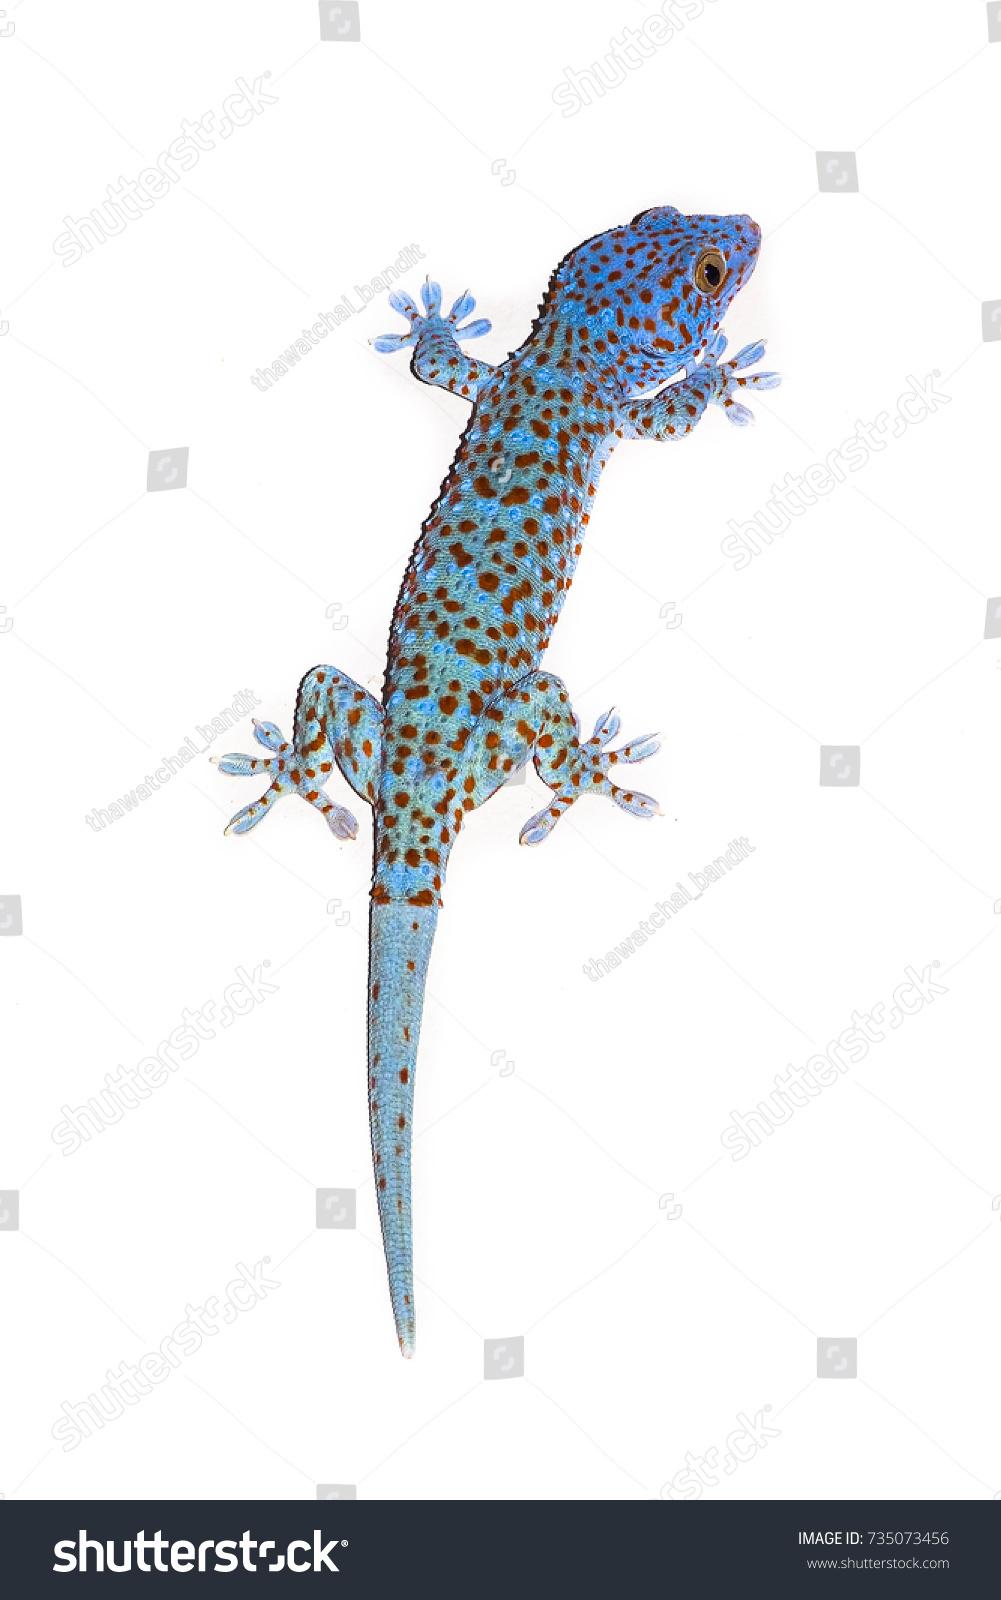 Hermosa Gecko Para Colorear Cresta - Dibujos Para Colorear En Línea ...